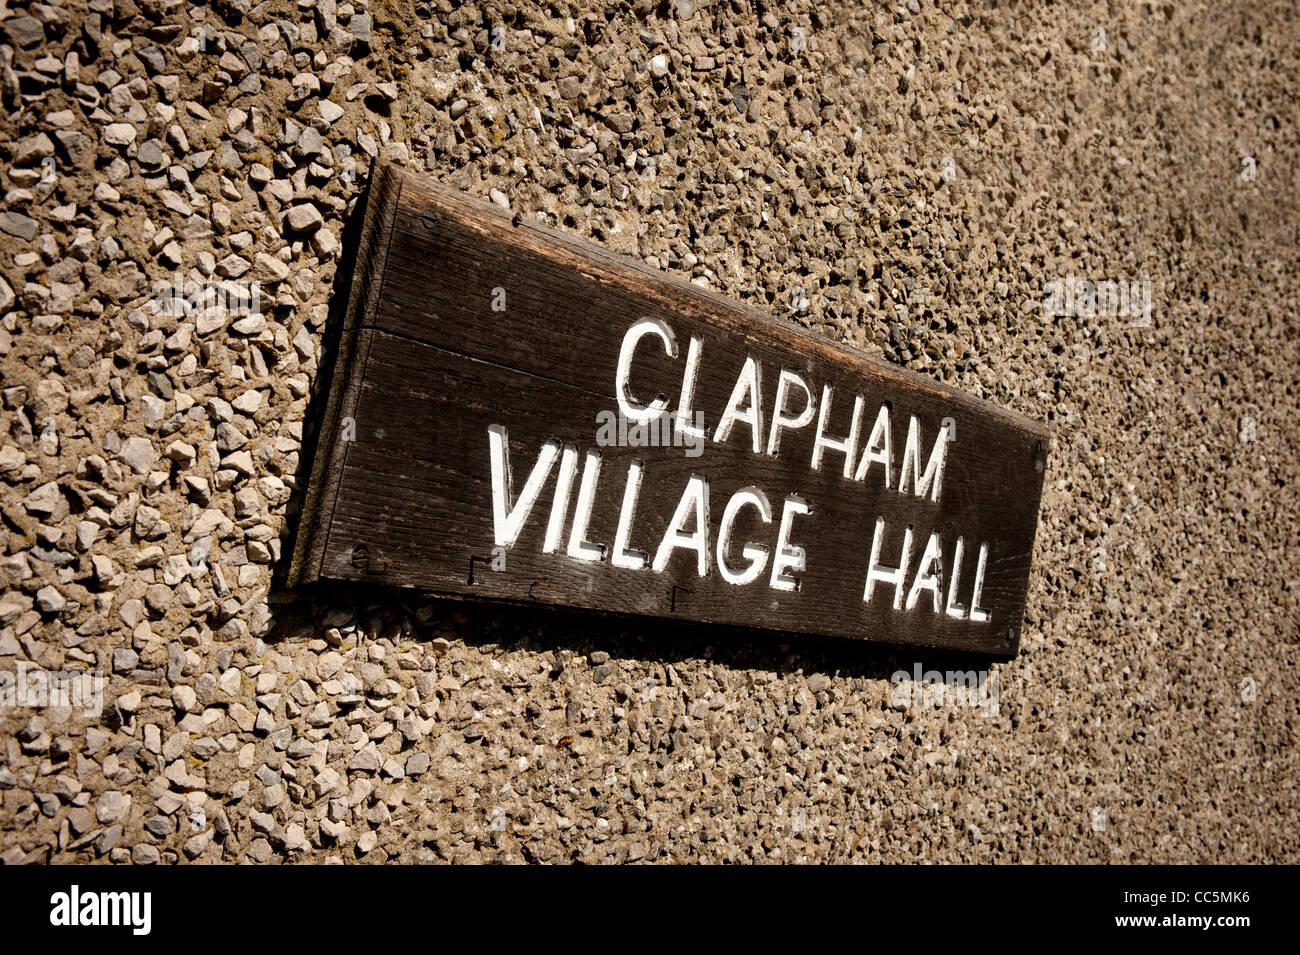 Clapham village hall sign - Stock Image